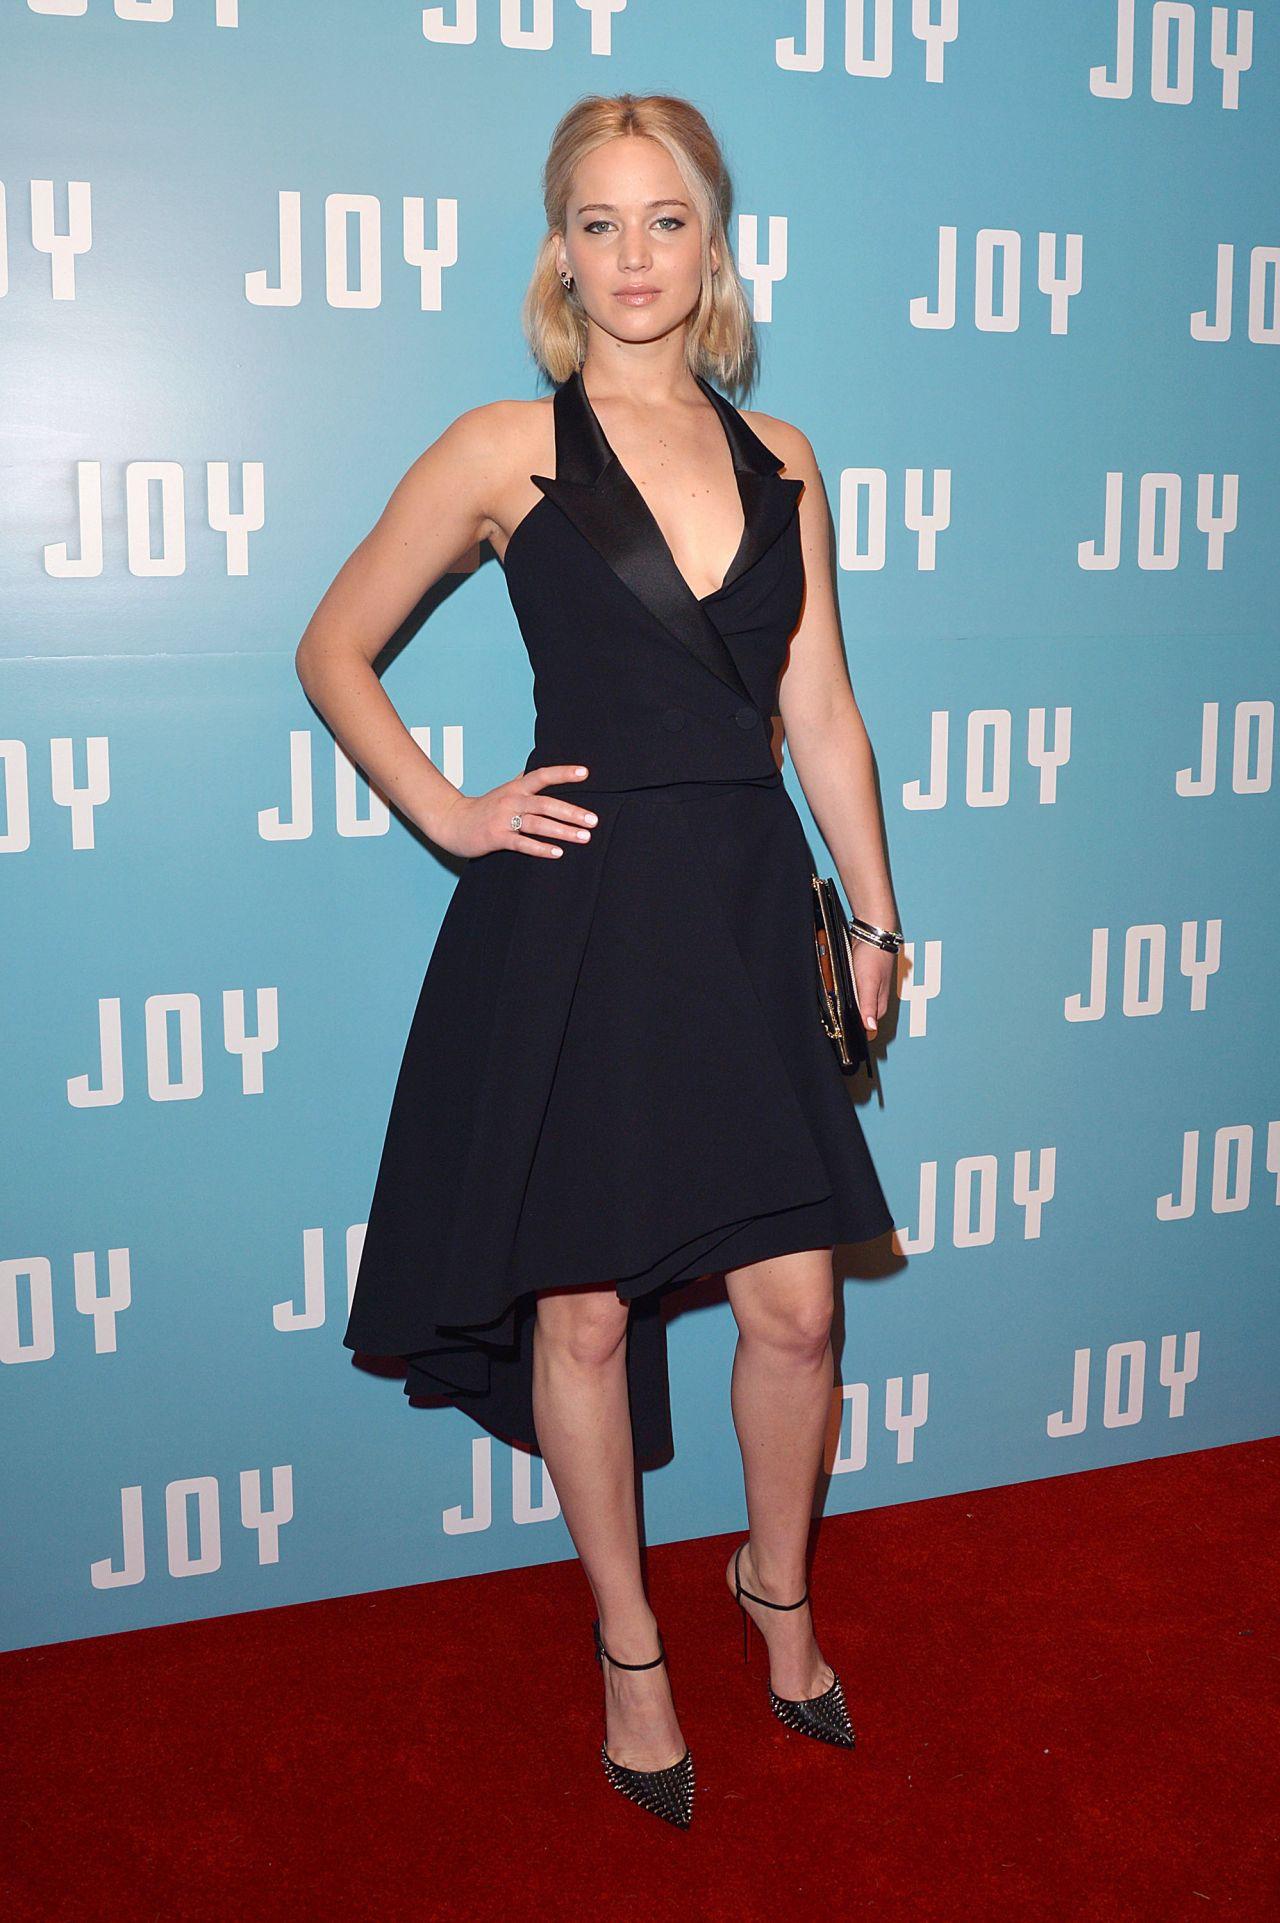 jennifer-lawrence-joy-screening-at-ham-yard-hotel-in-london_1